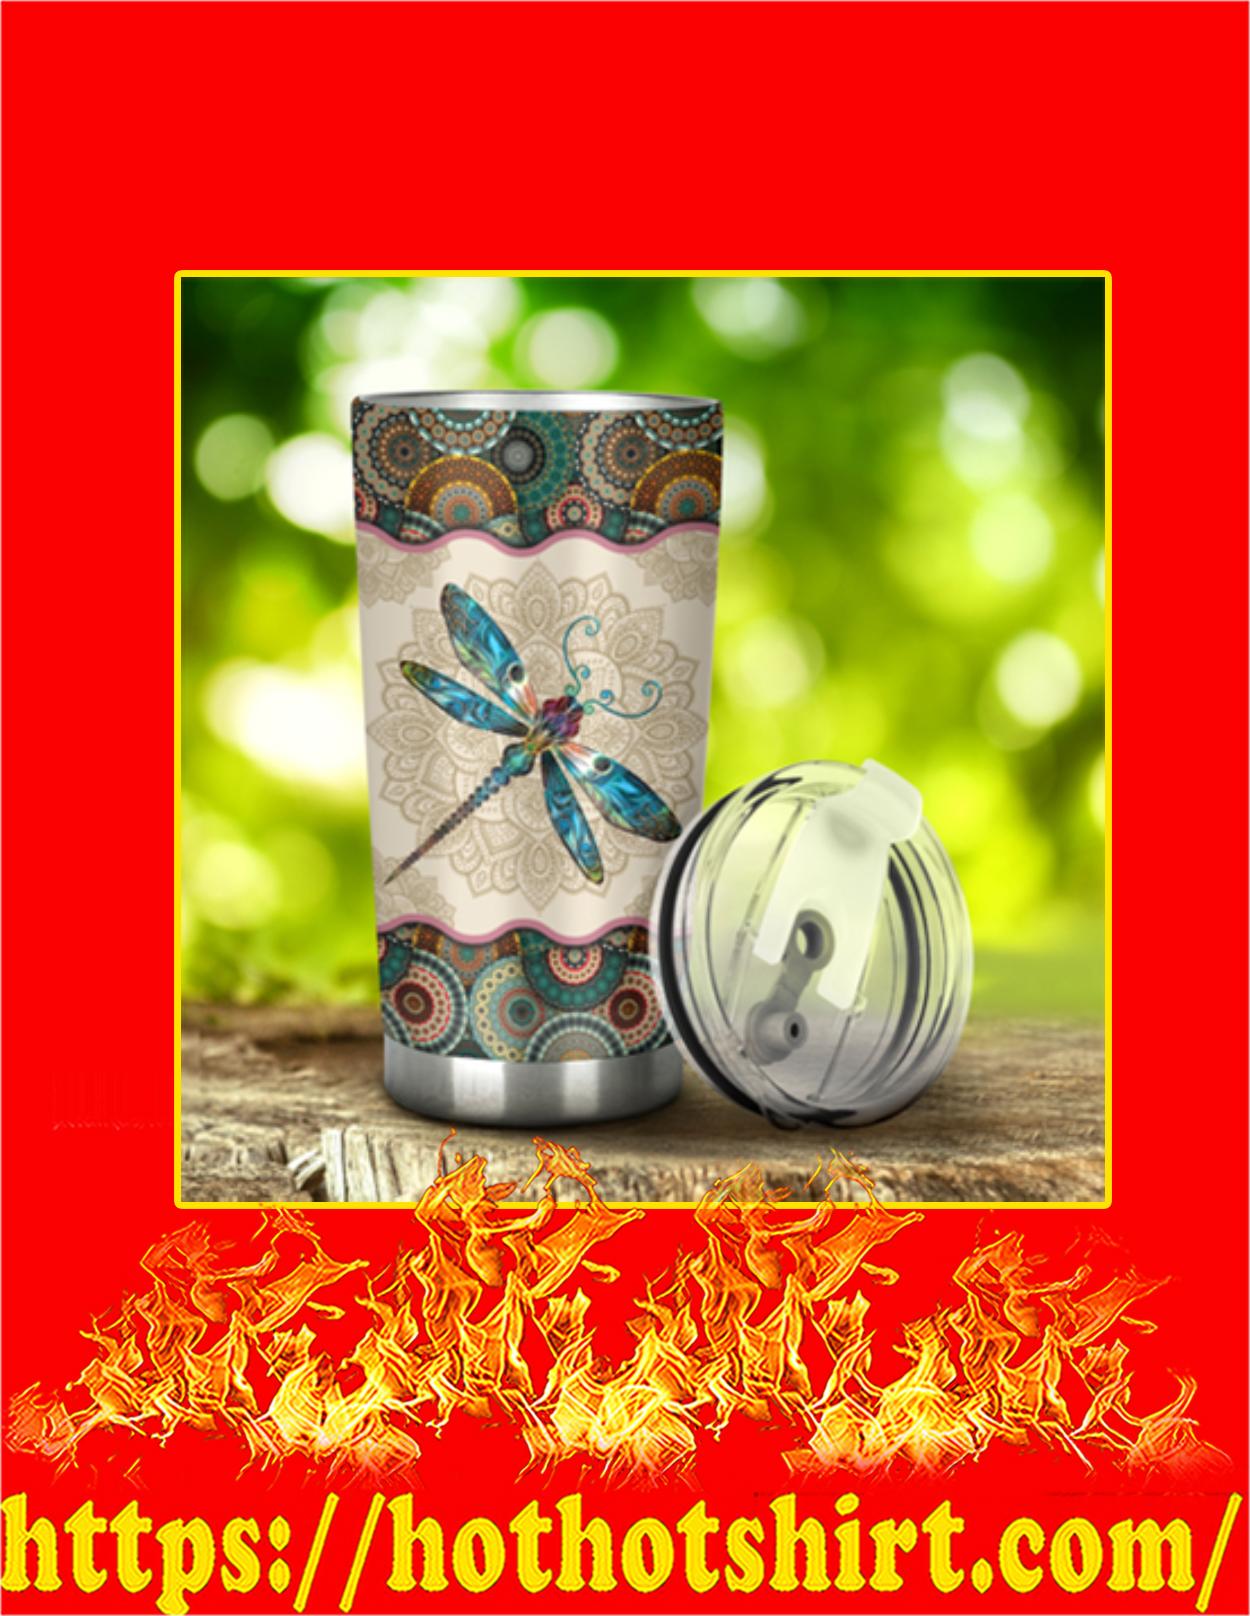 Dragonfly vintage mandala tumbler - Pic 1